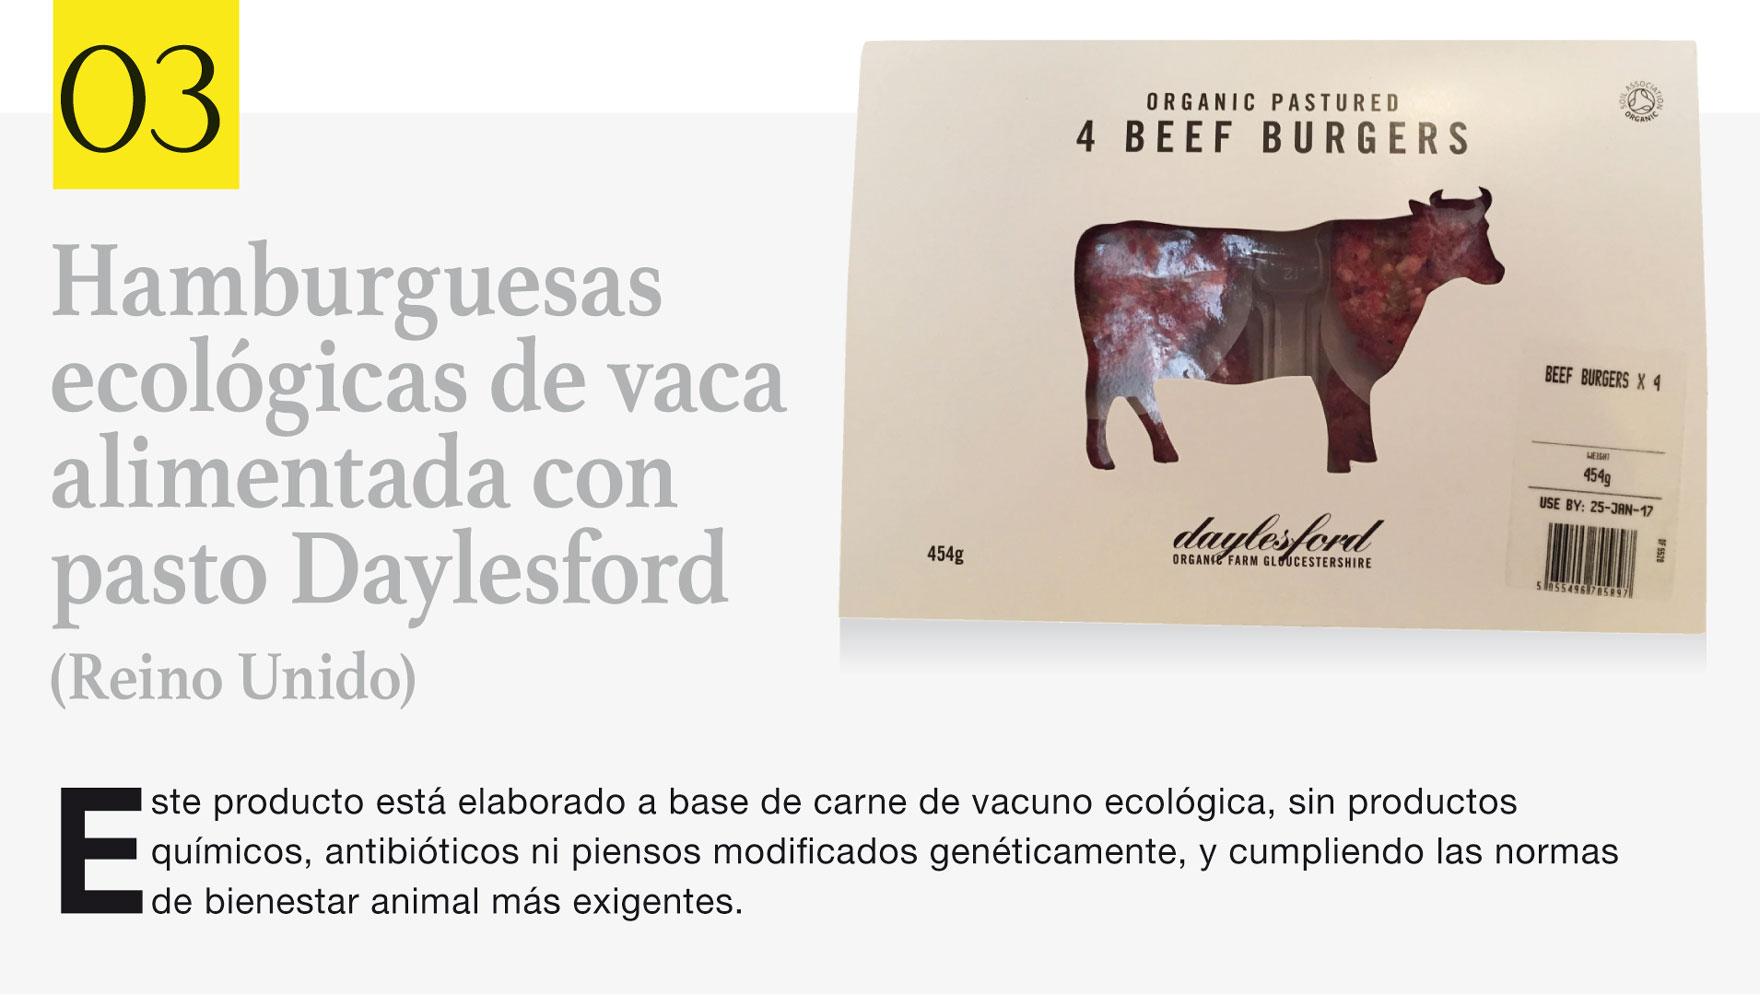 Hamburguesas ecológicas de vaca alimentada con pasto Daylesford (Reino Unido)